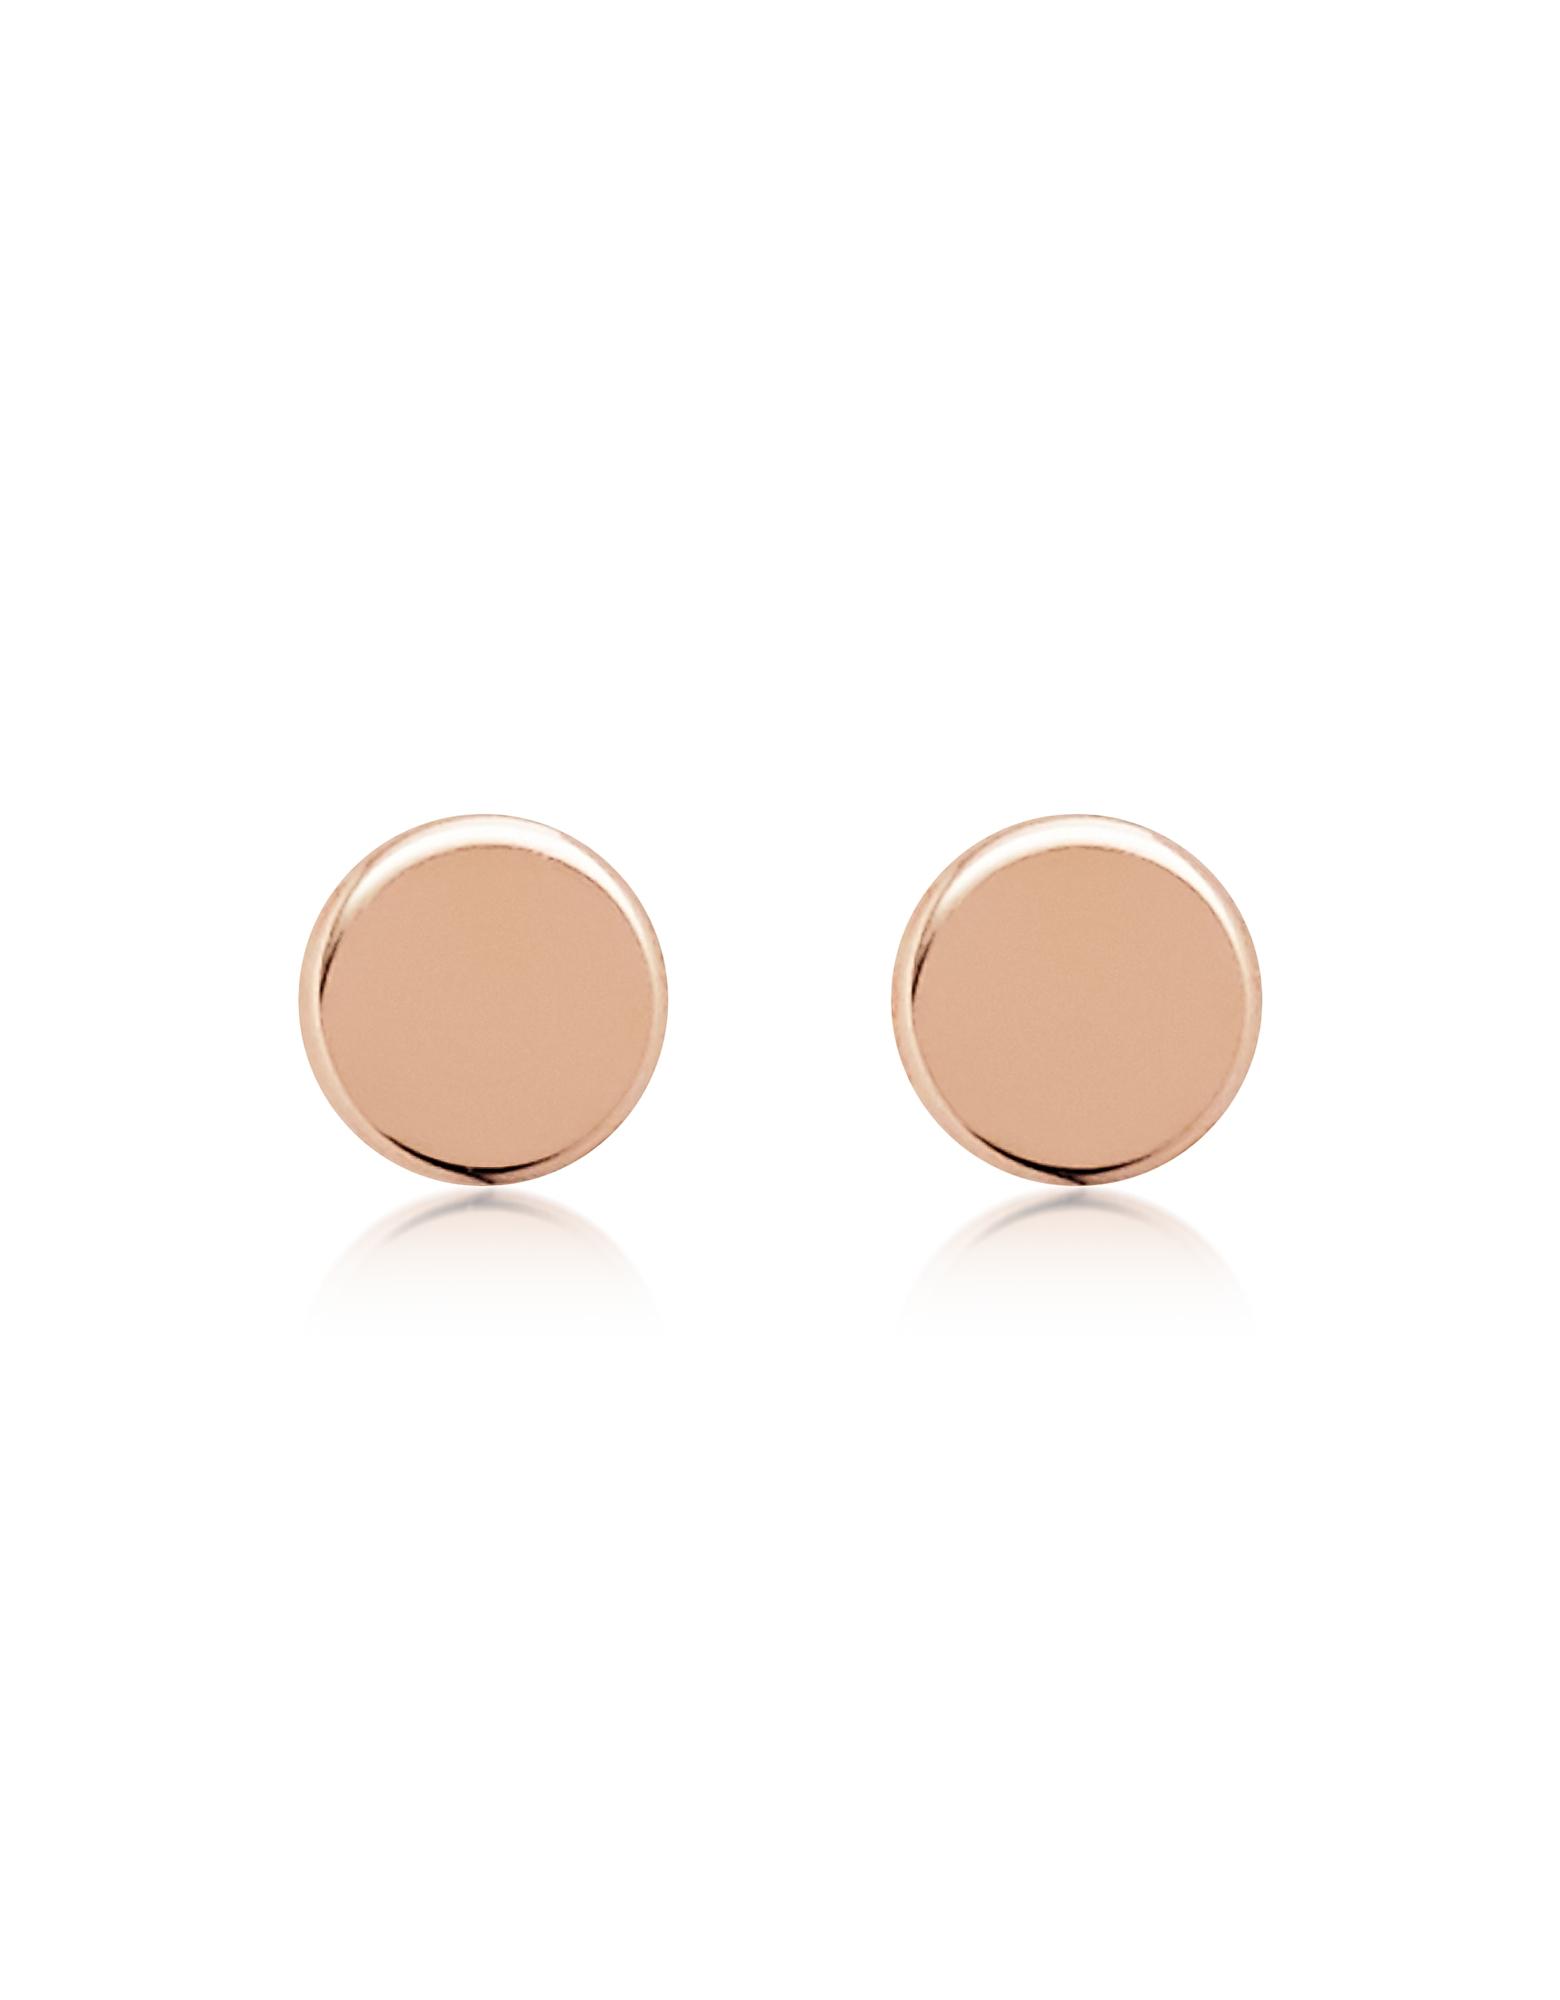 Fossil Earrings, Rose Gold Tone Round Stud Earrings